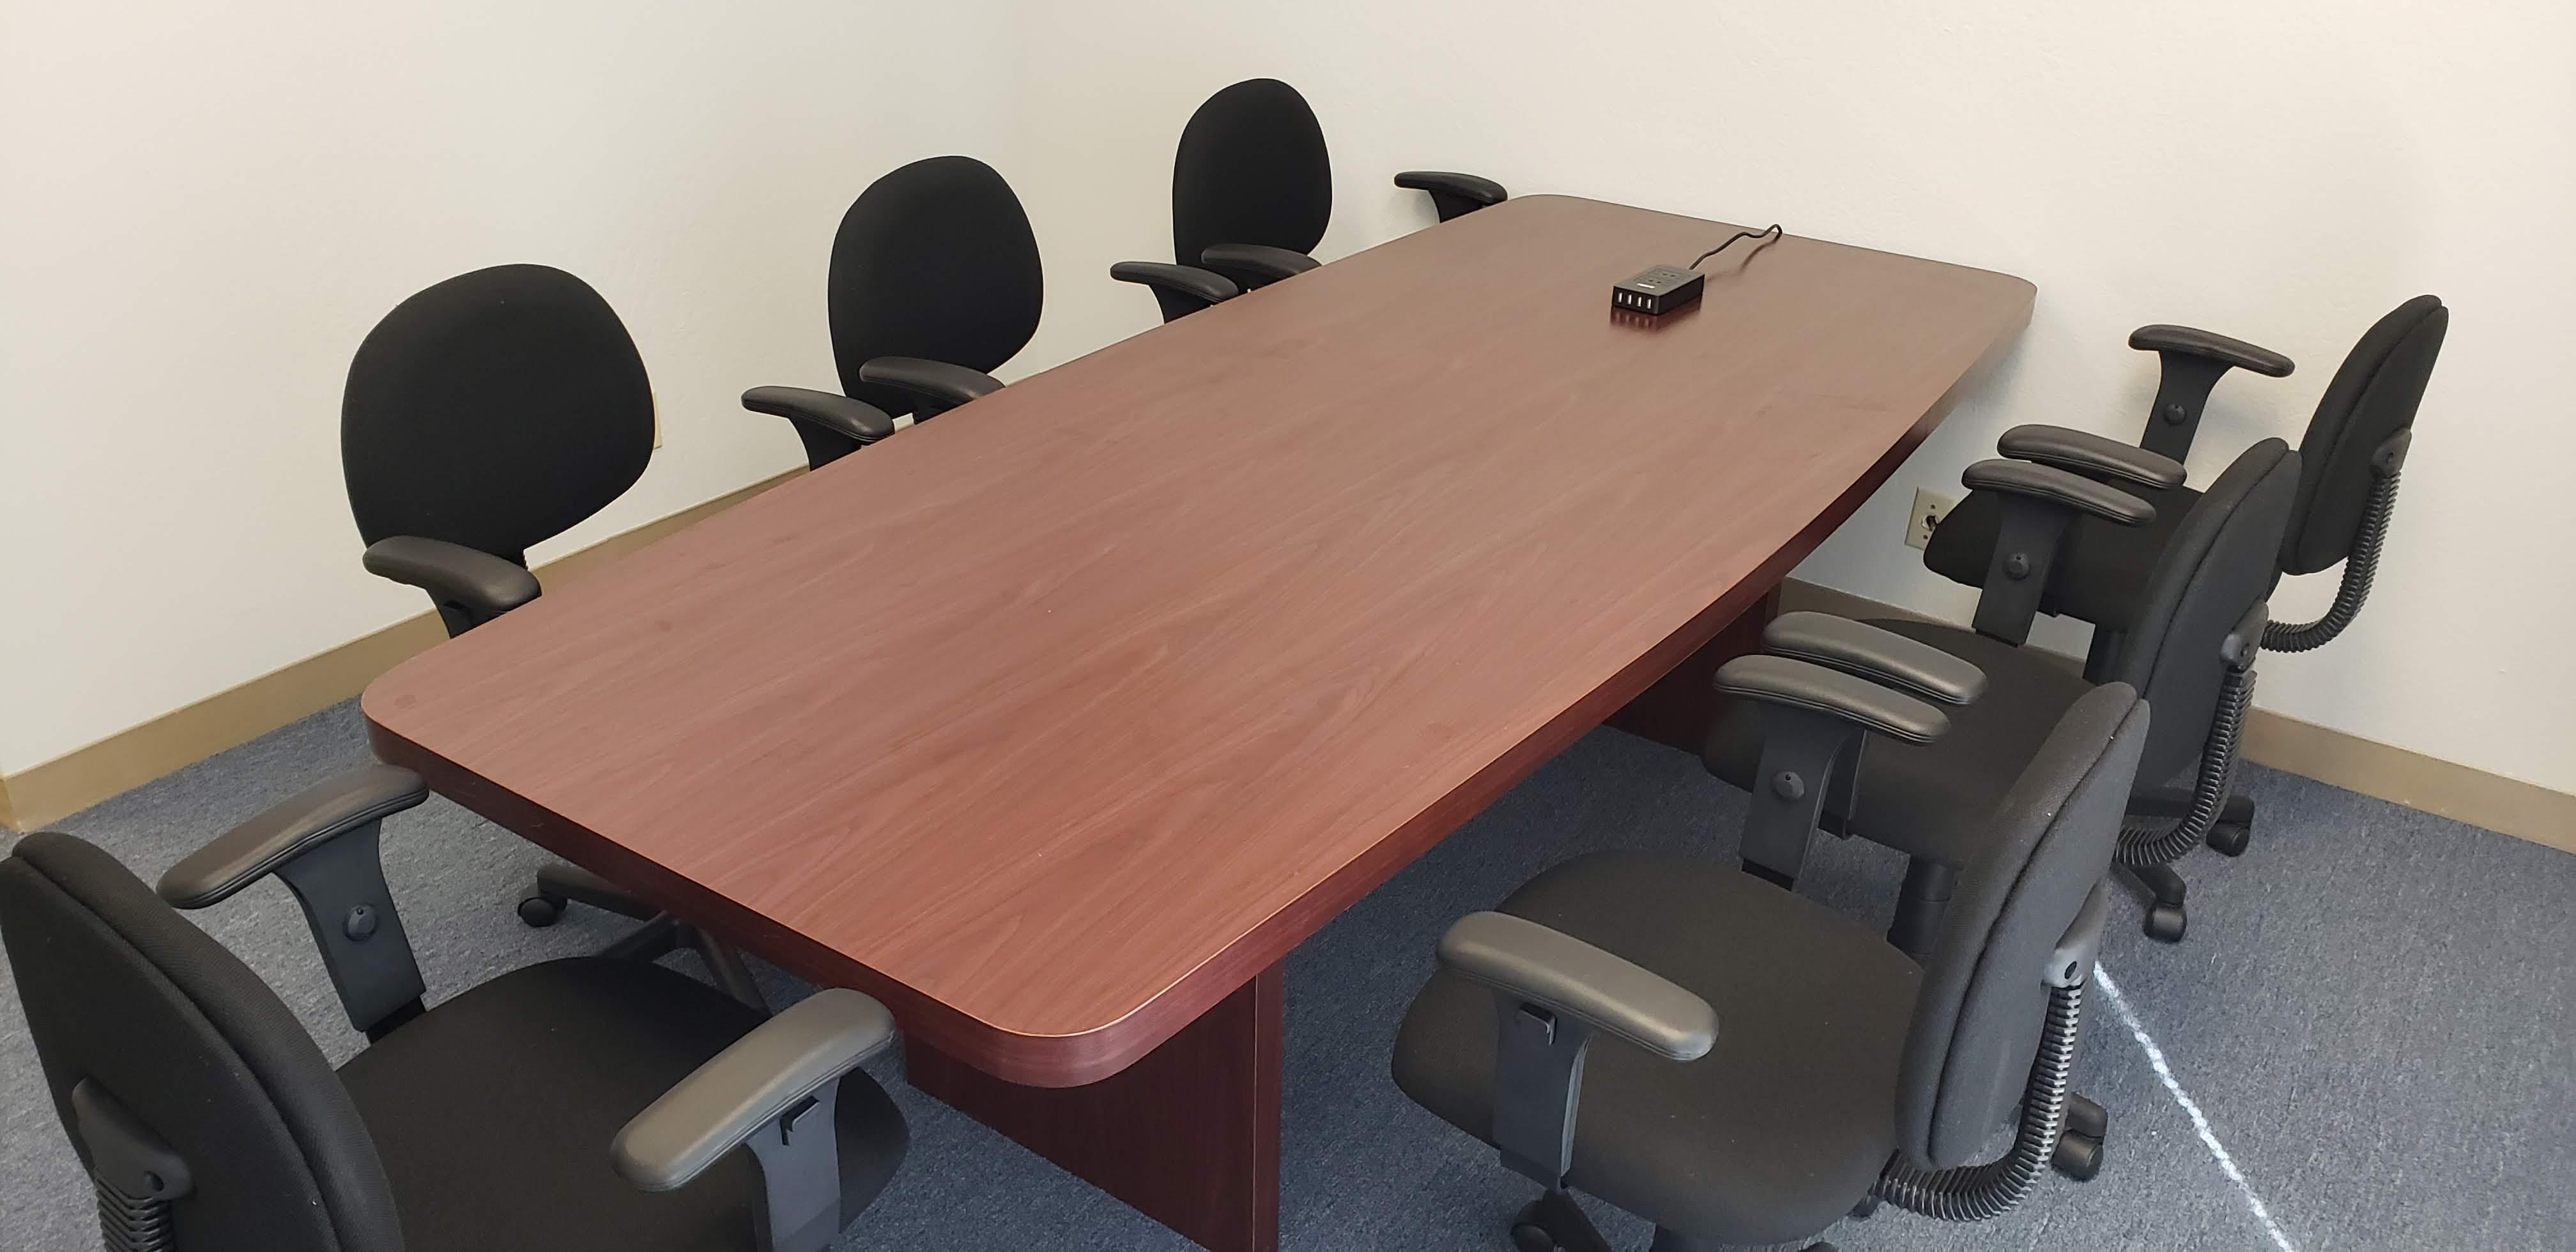 ATG Multimedia Center - Meeting Room 1